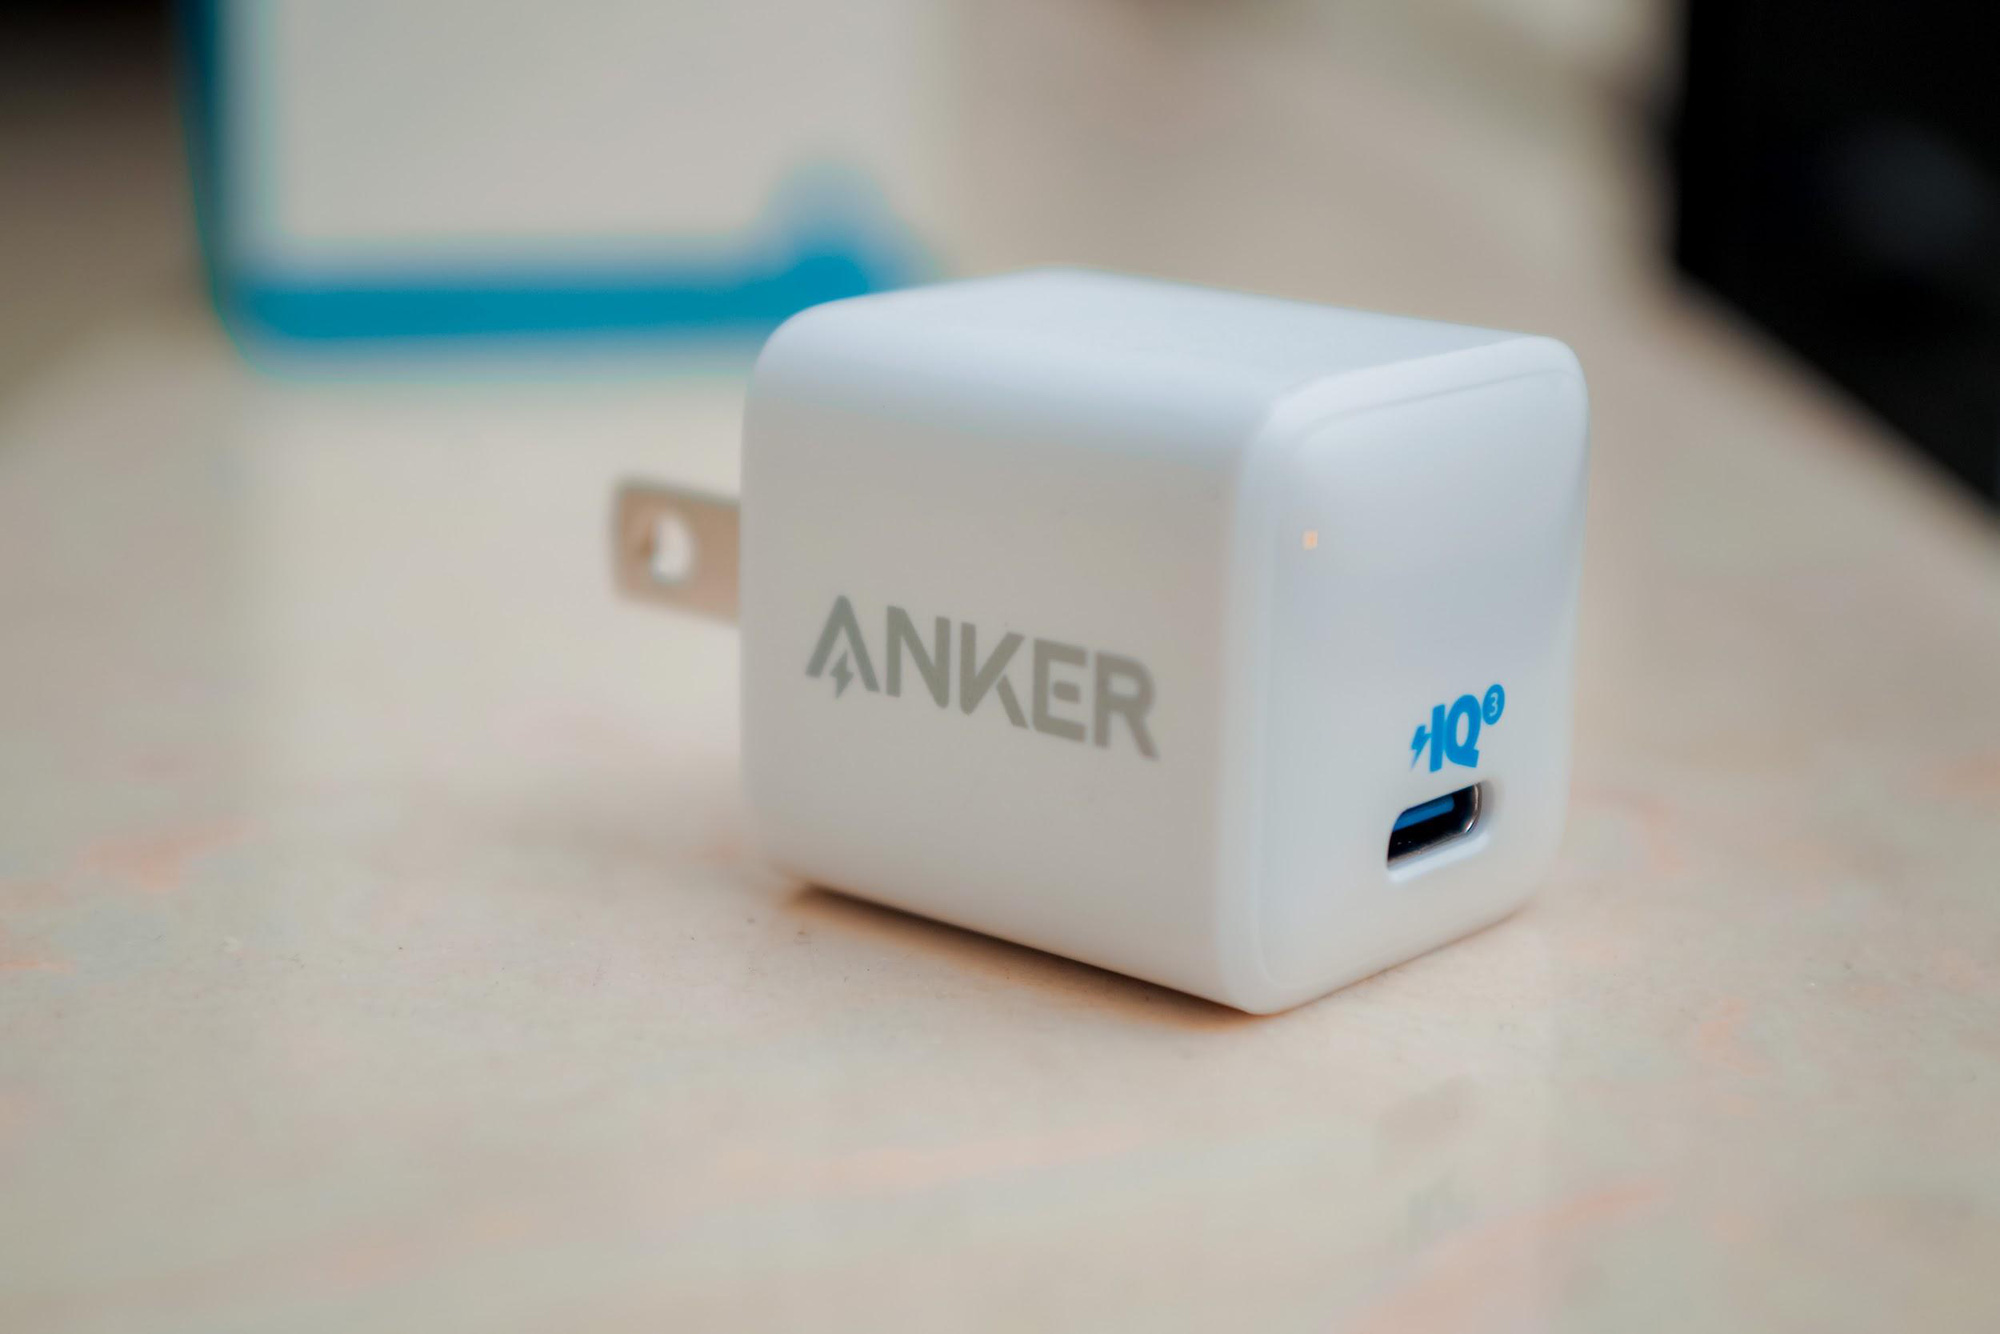 Combo sạc cáp siêu nhỏ gọn Anker PowerPort III Nano và PowerLine III - Ảnh 3.